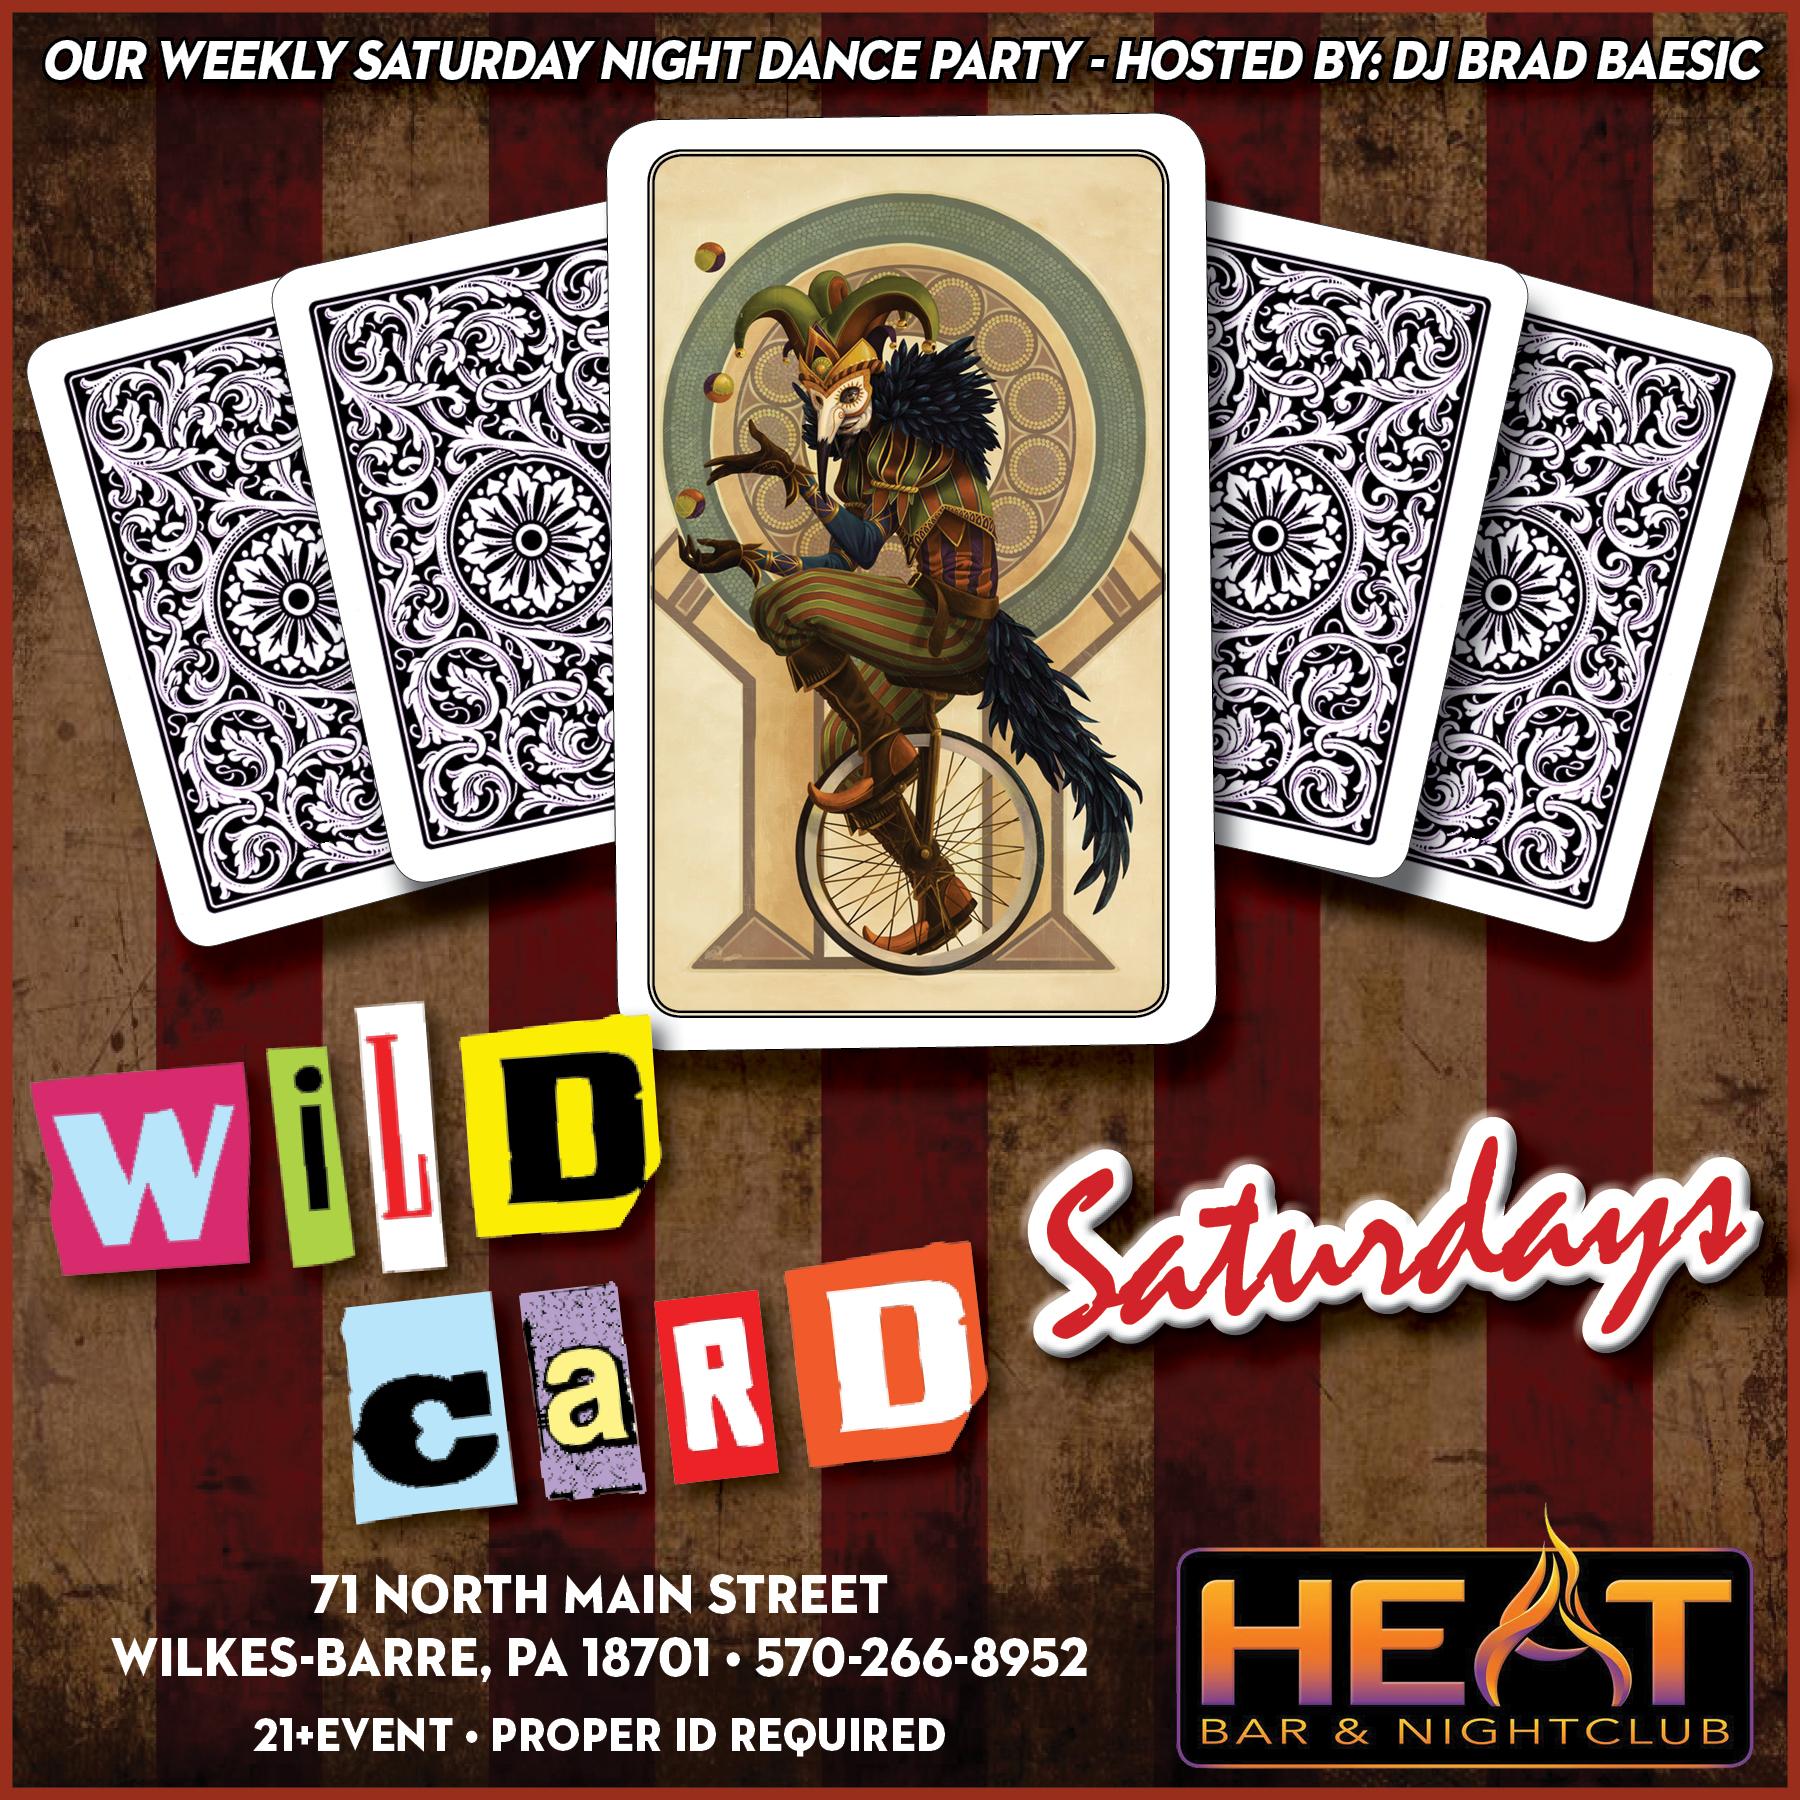 Heat_Wildcard_Saturdays_For_Website